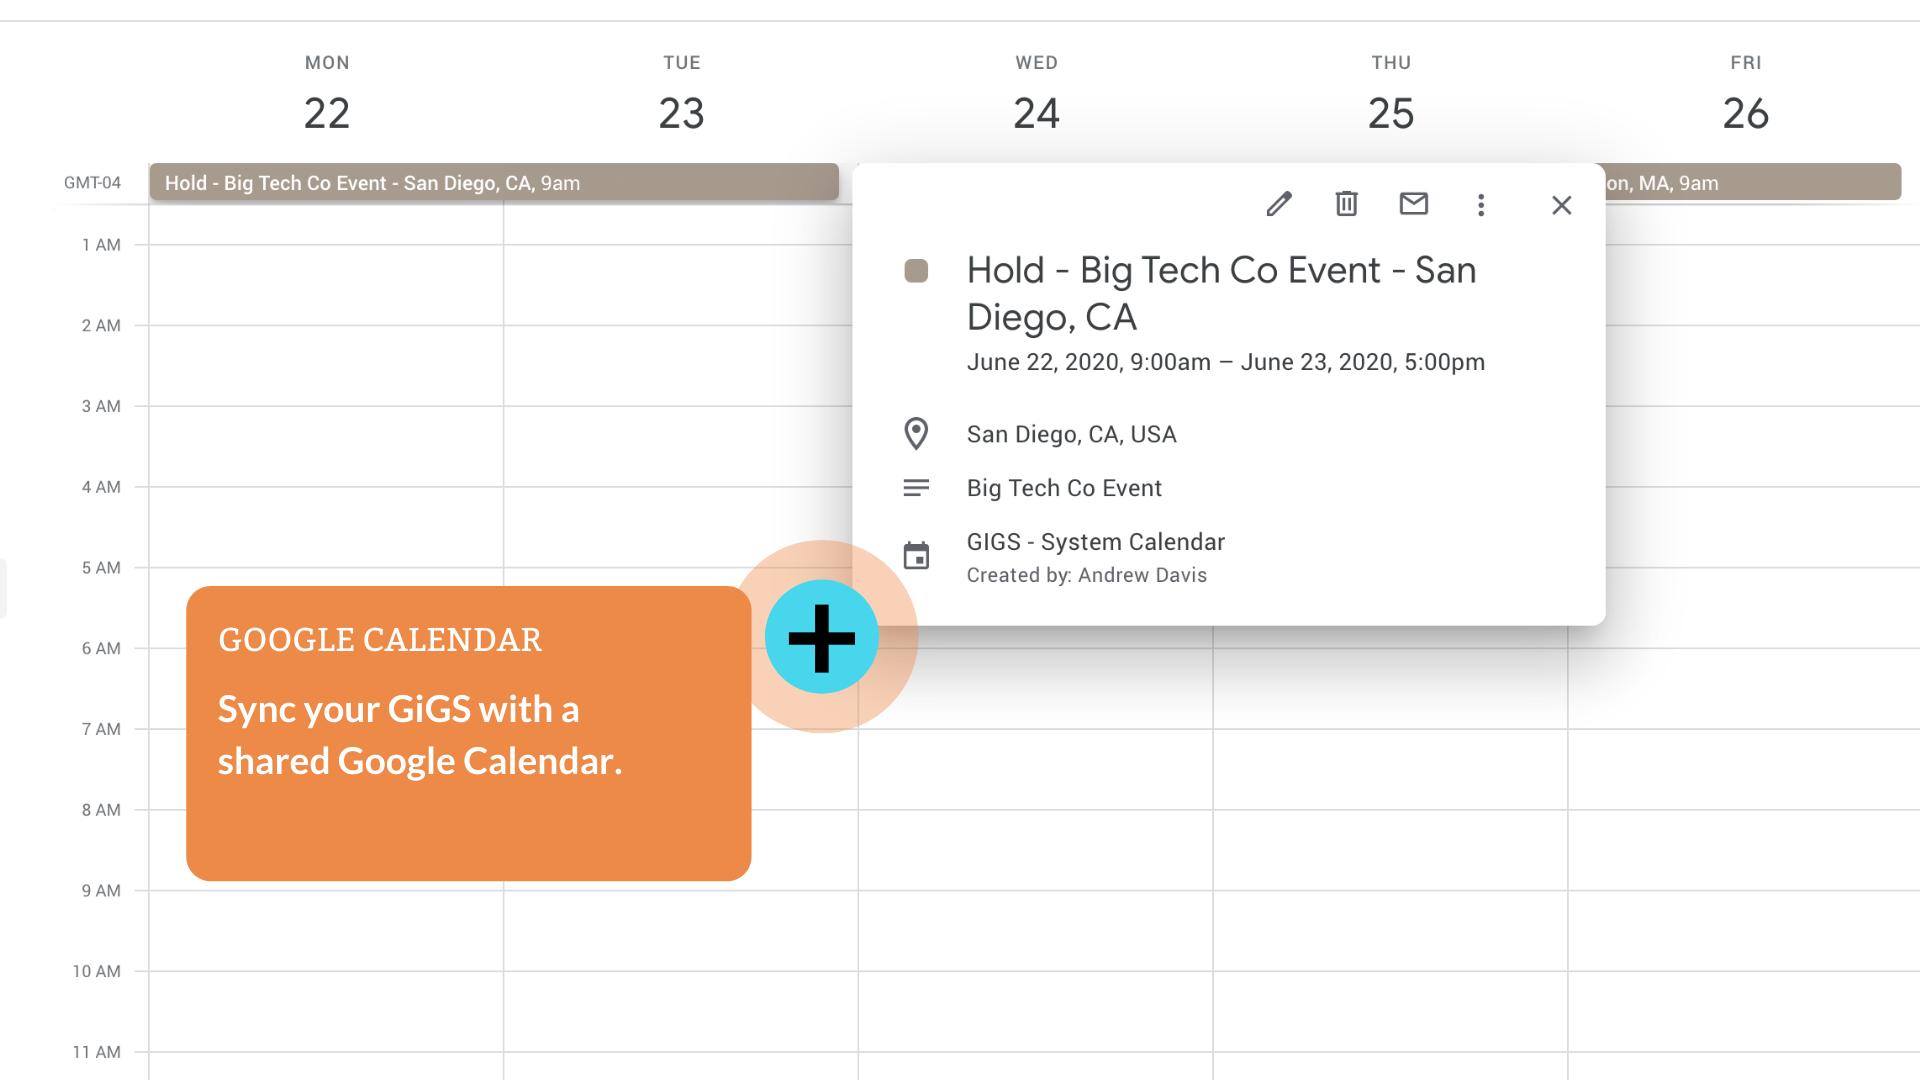 Sync all your GiGS with a shared Google Calendar